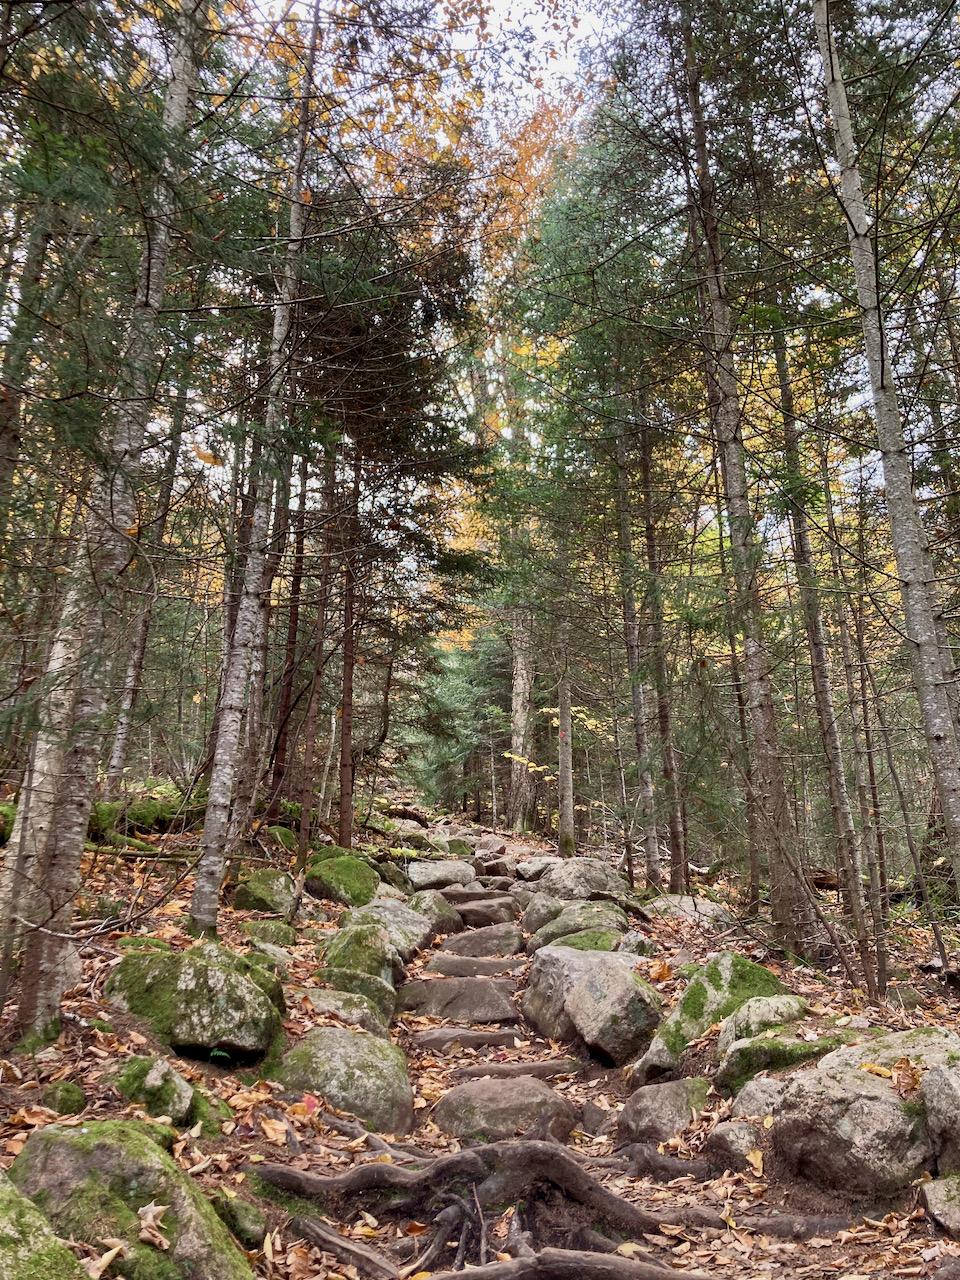 Rocky hillside, with steps carved into rockface.